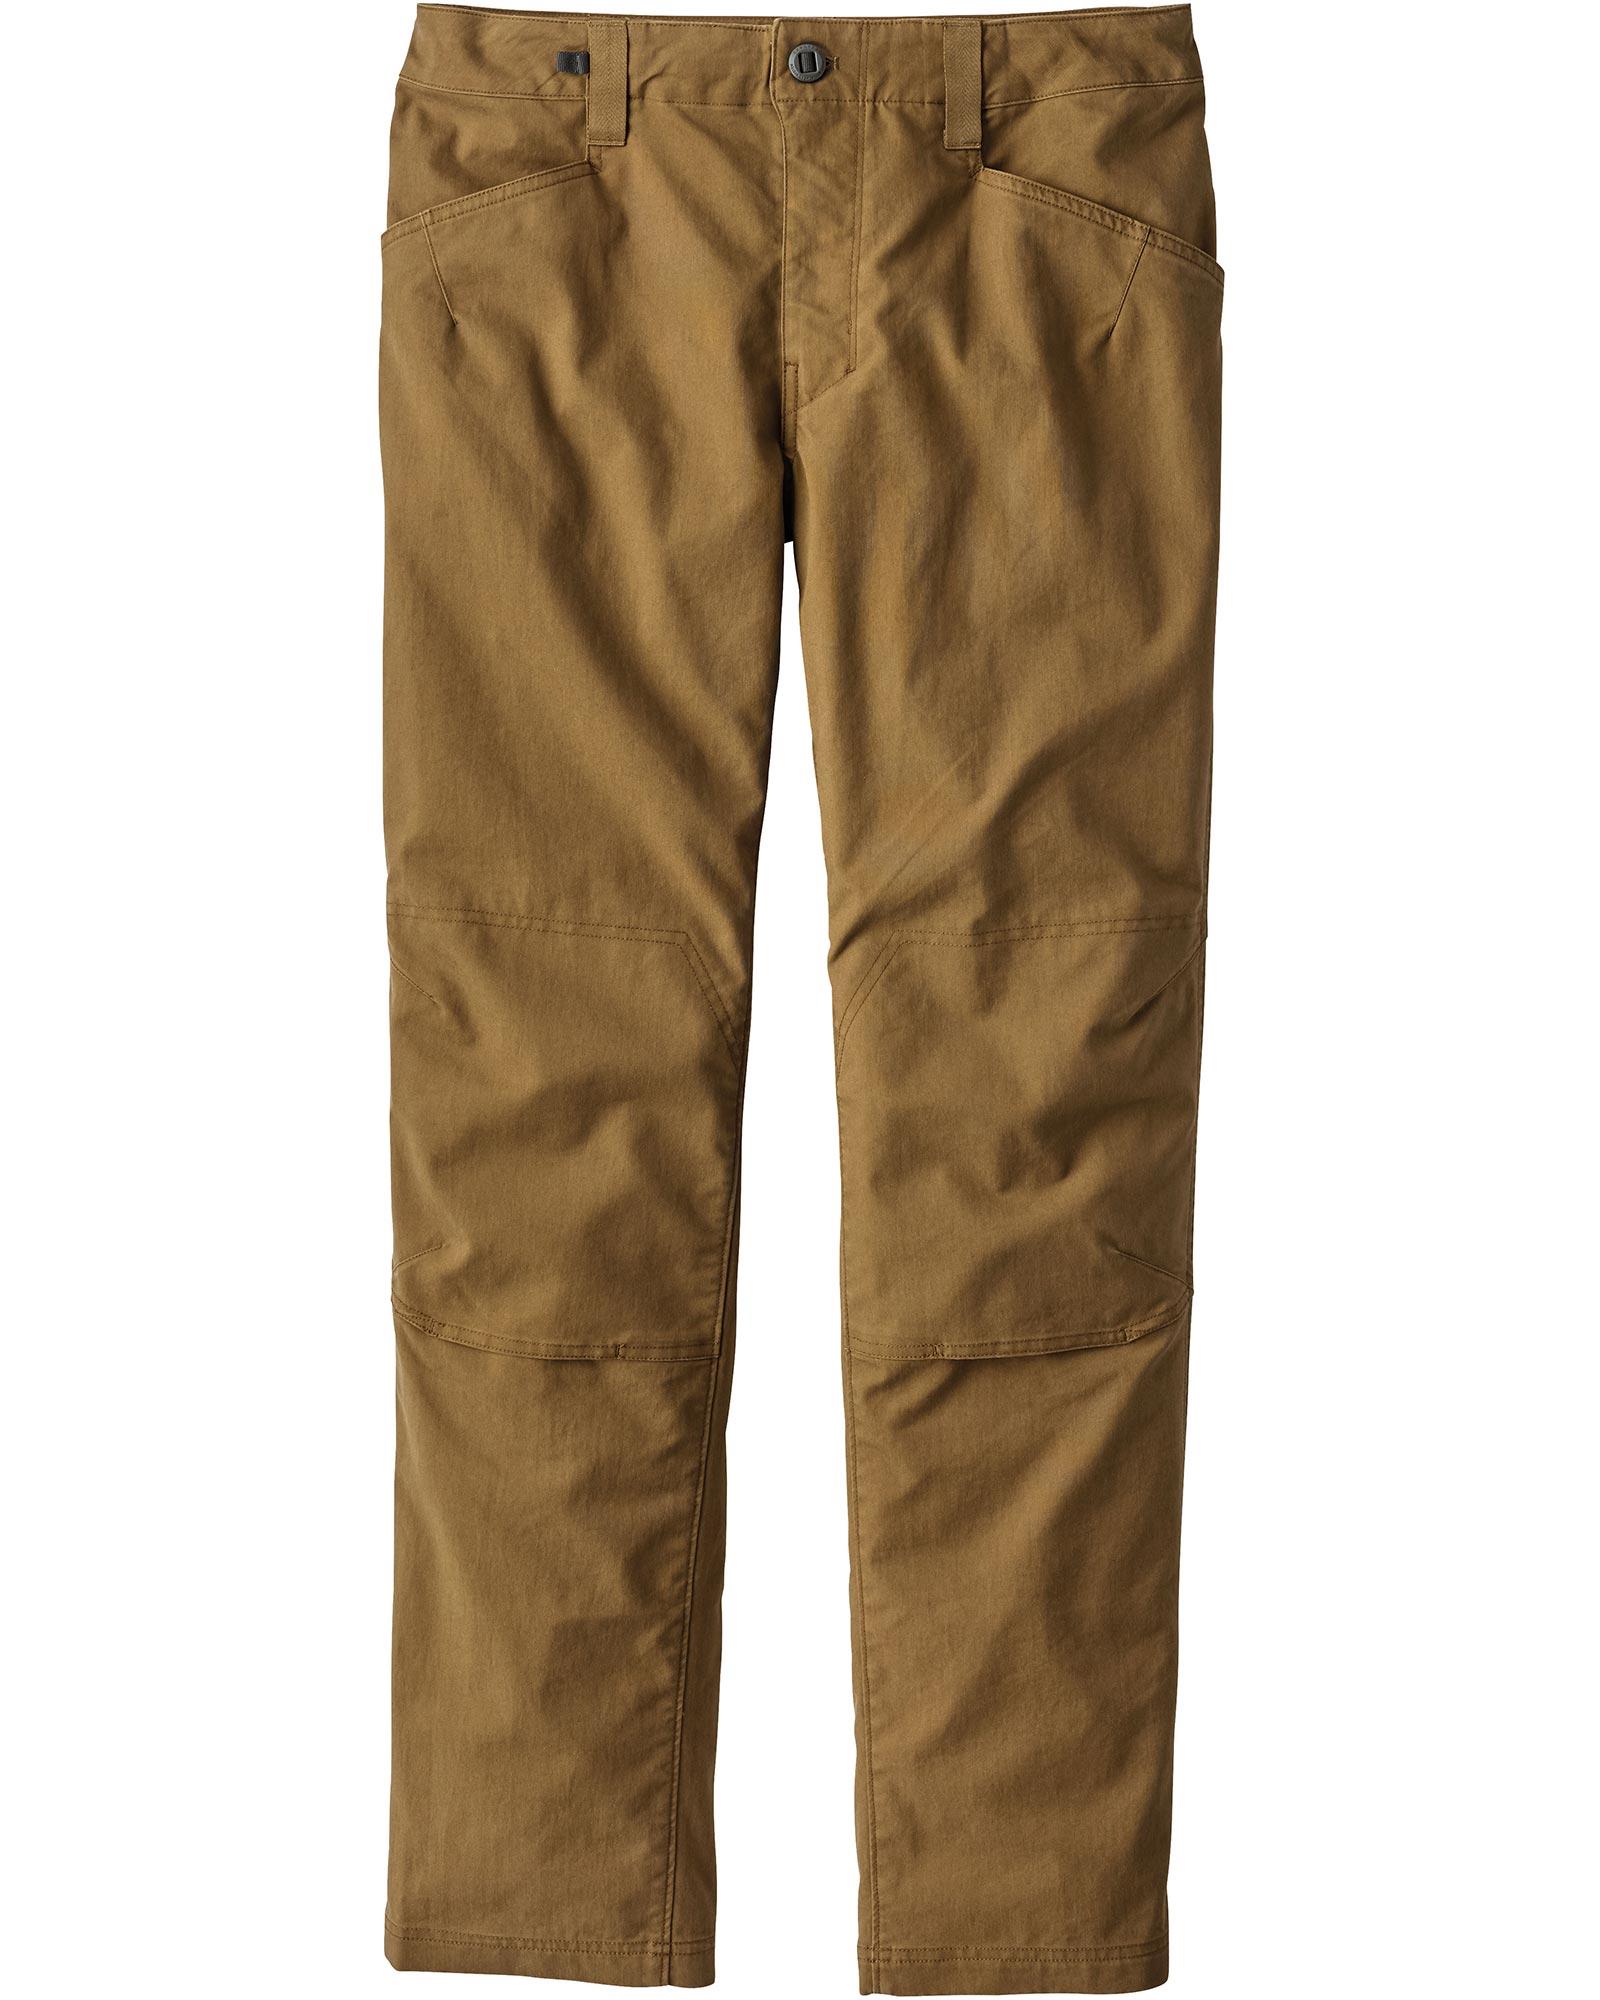 Patagonia Men's Gritstone Rock Pants 0